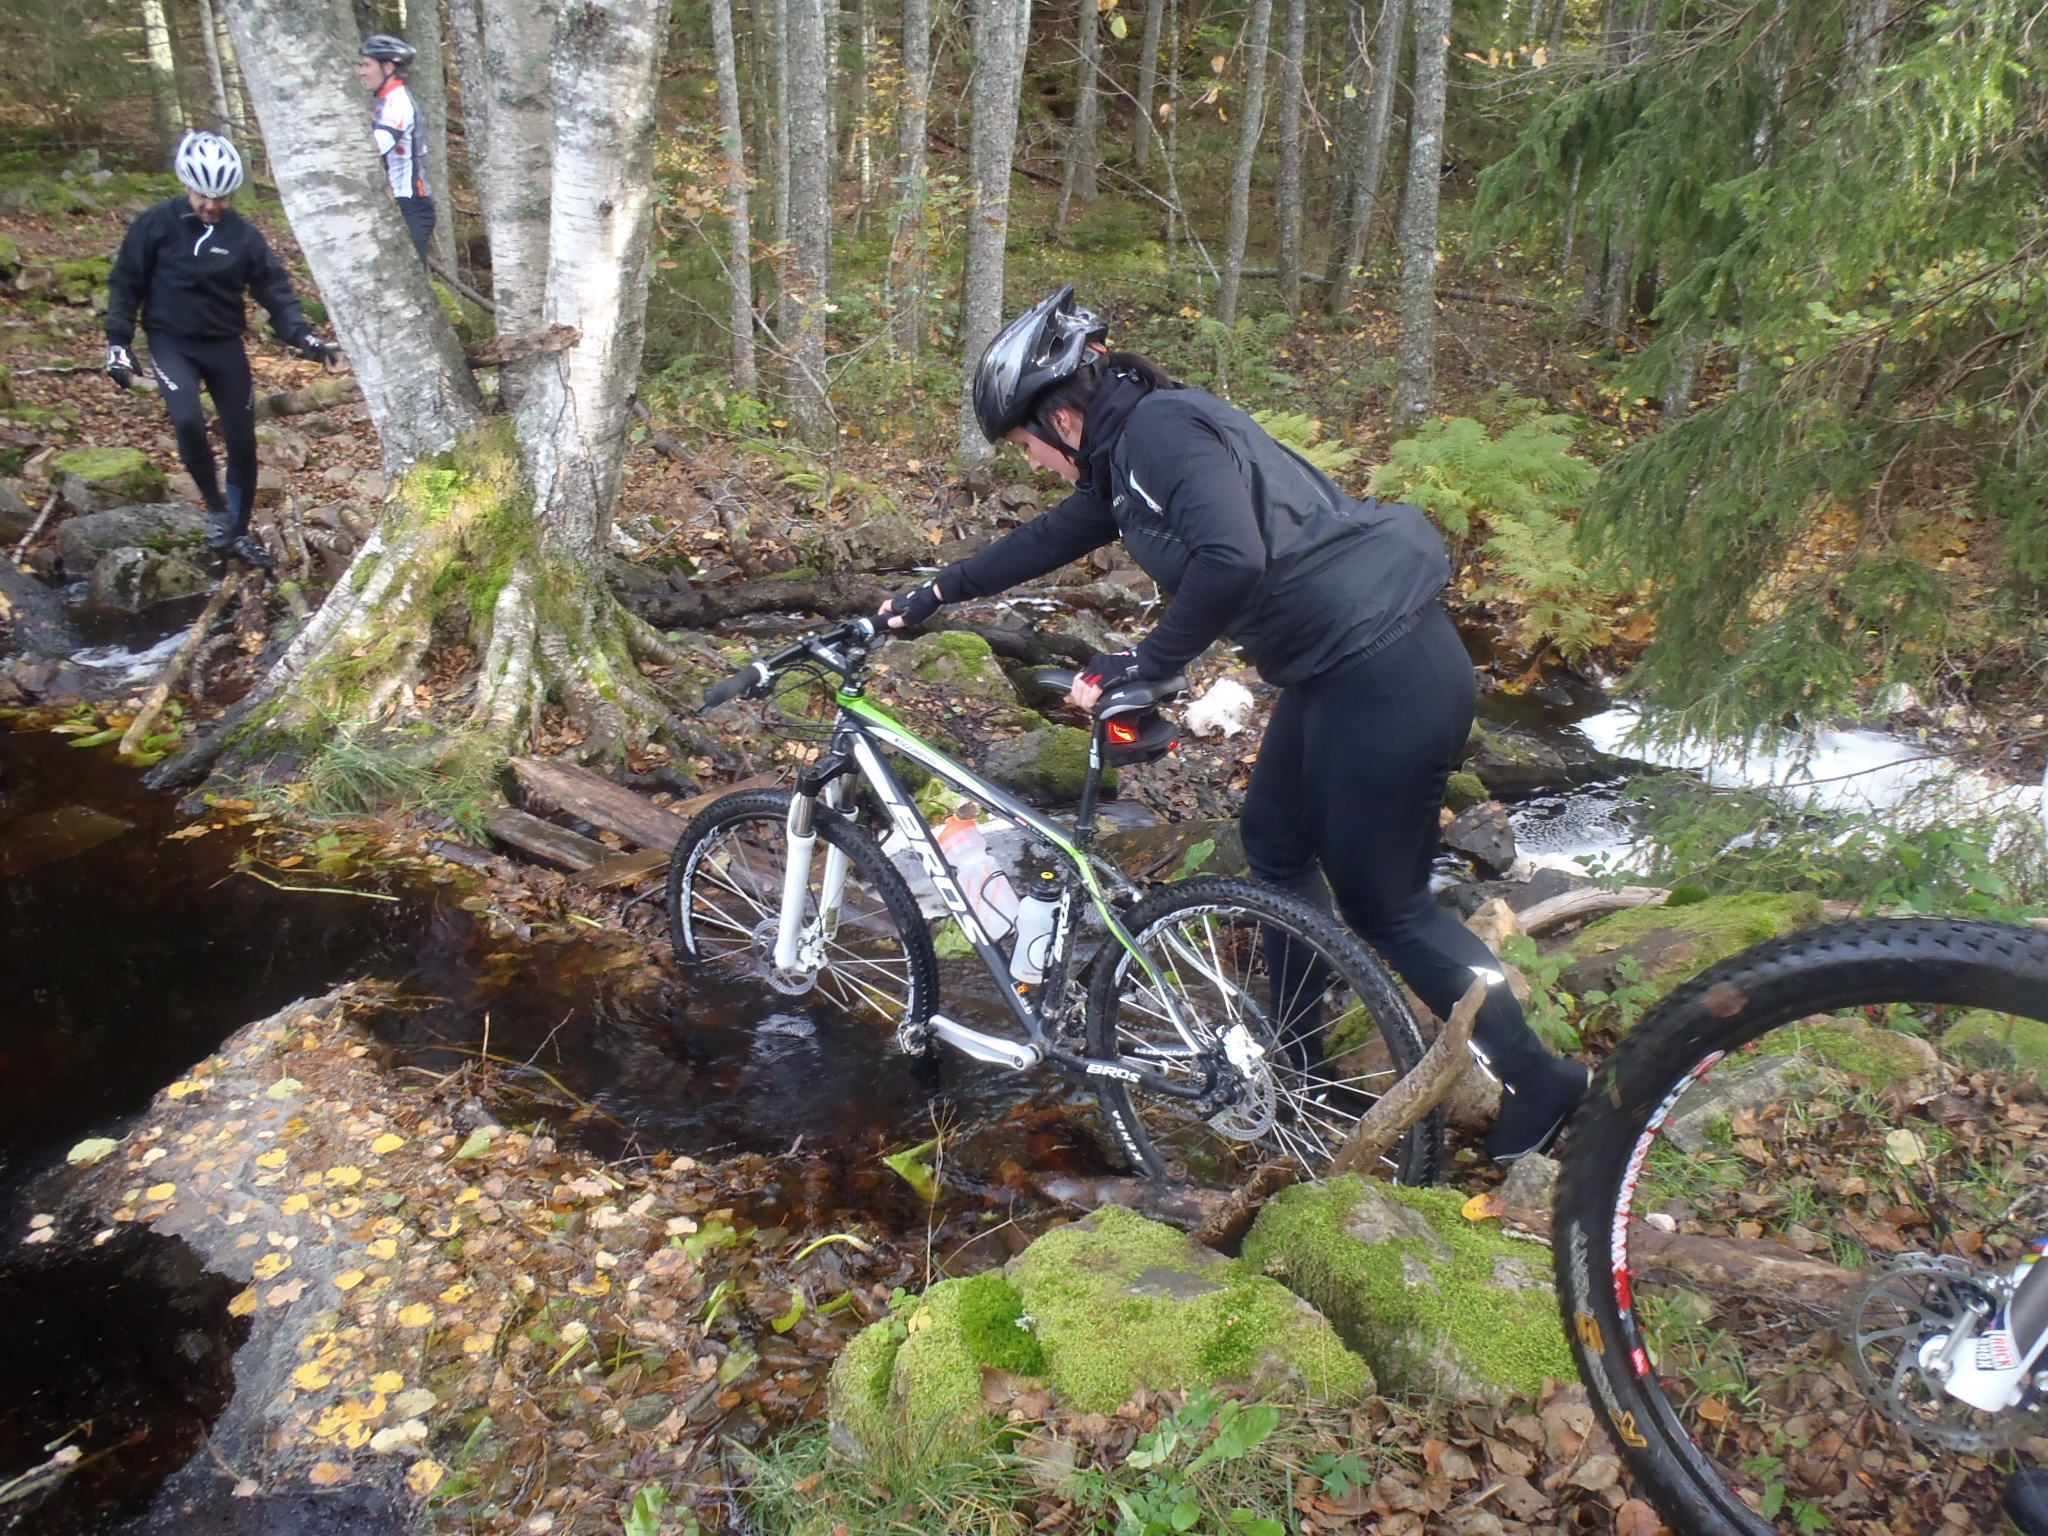 Mountain Biken auf kniffeligen Pfaden am See Helgasjön